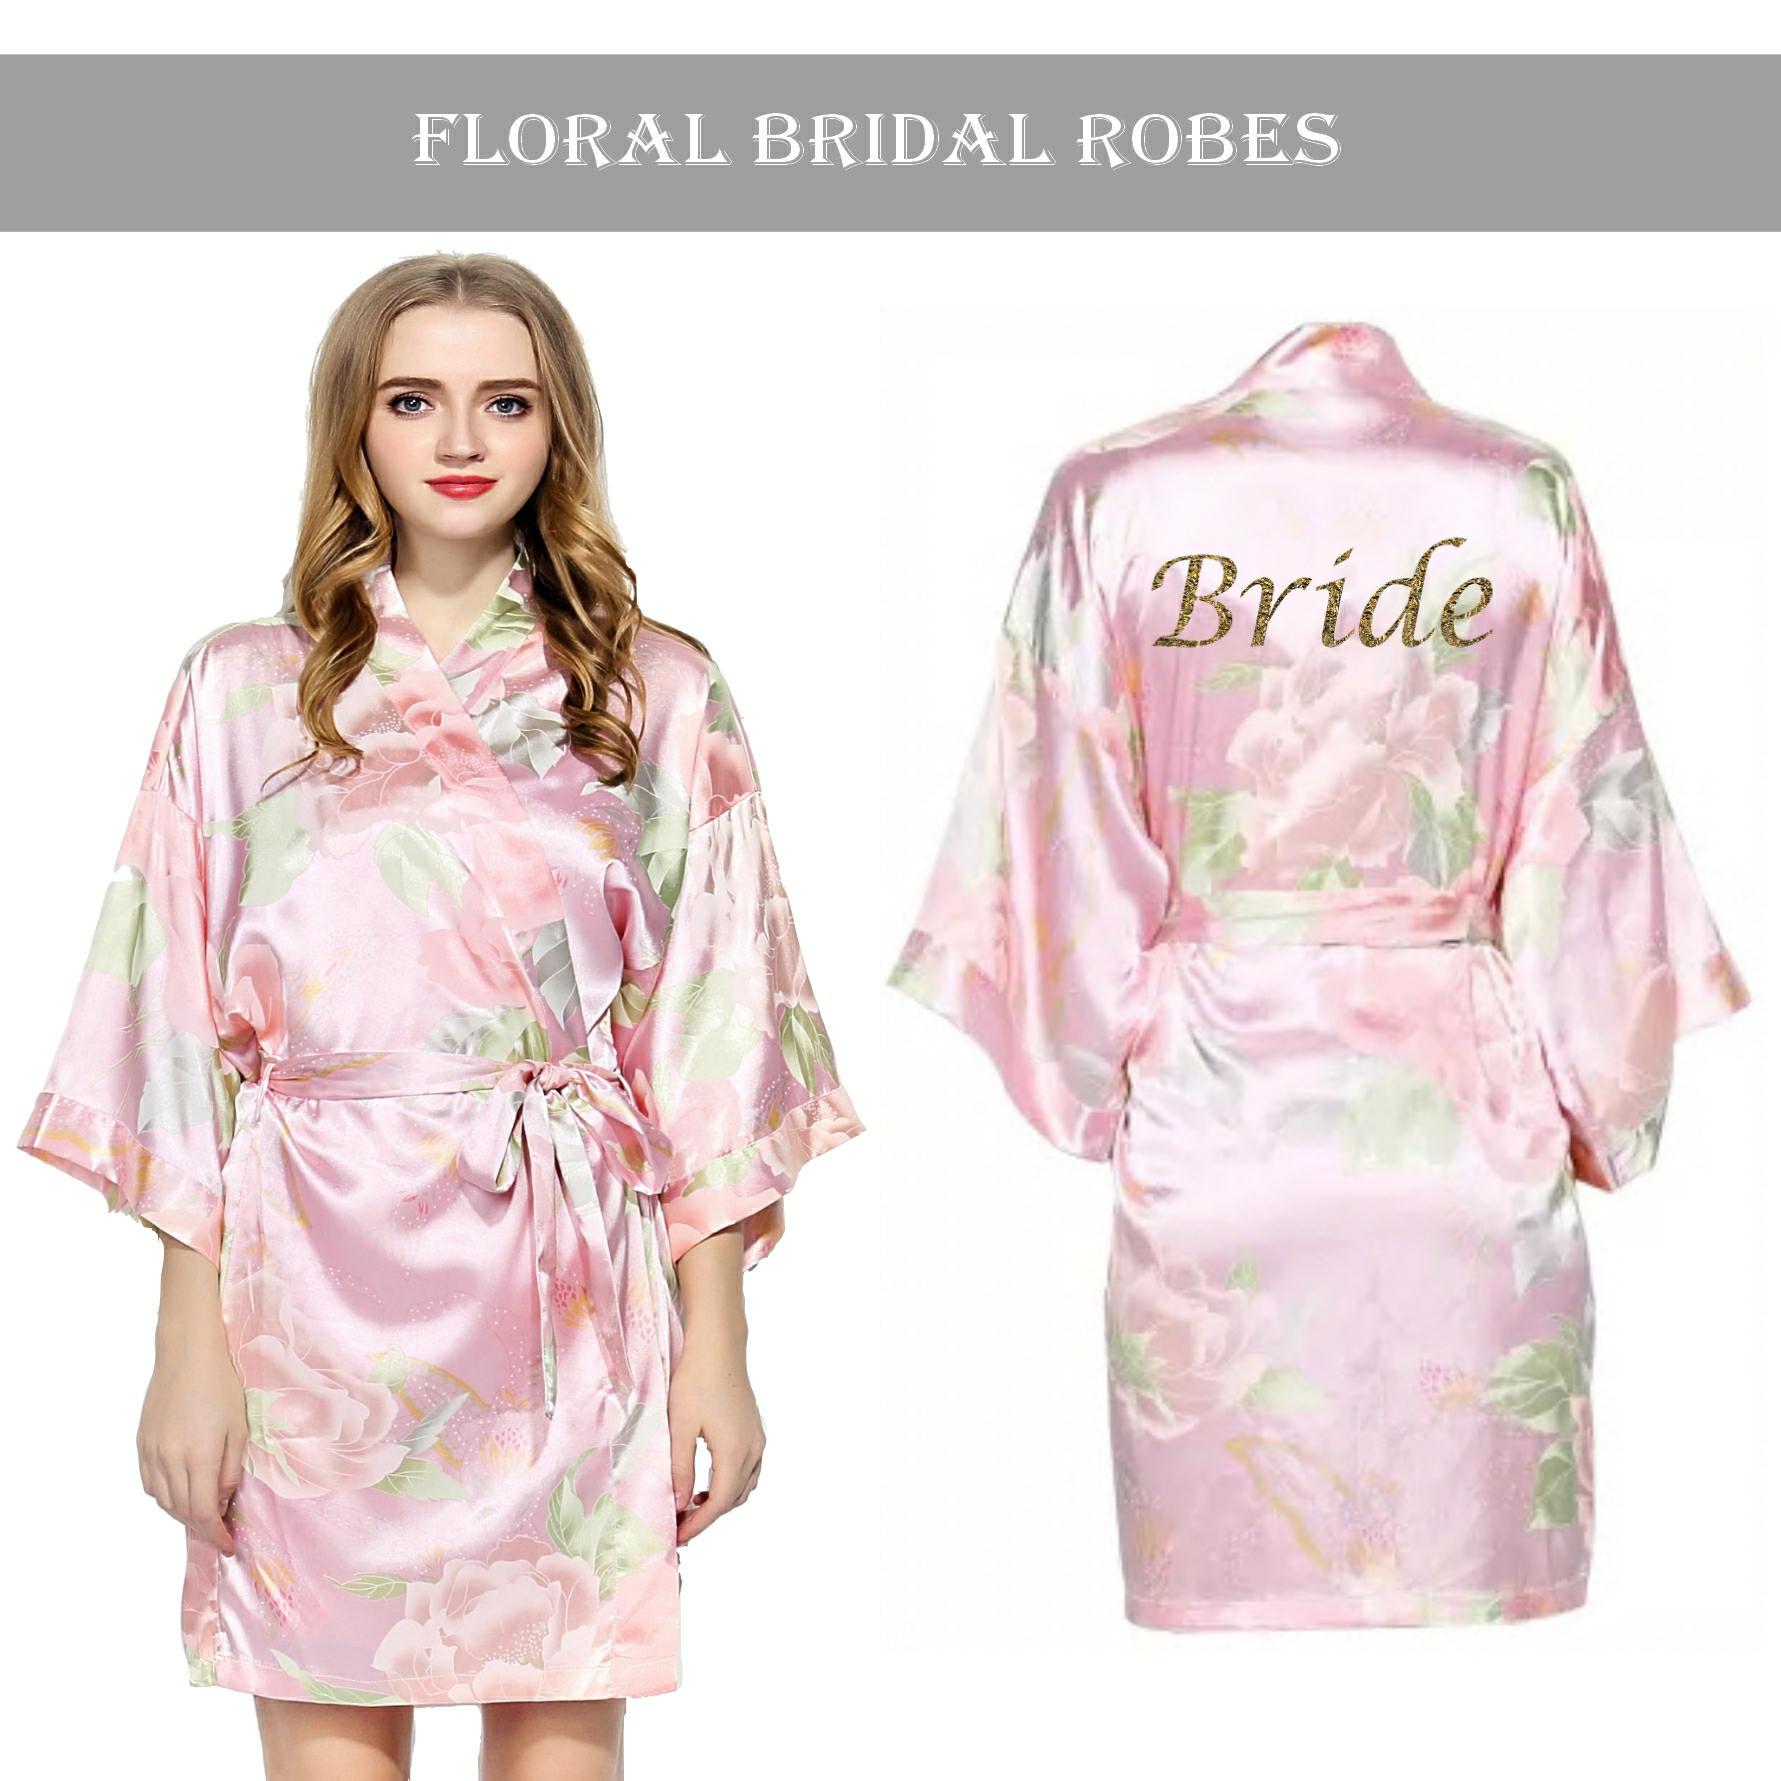 Personalised Vintage Floral Satin Bridal Robes-Light Pink. | Etsy